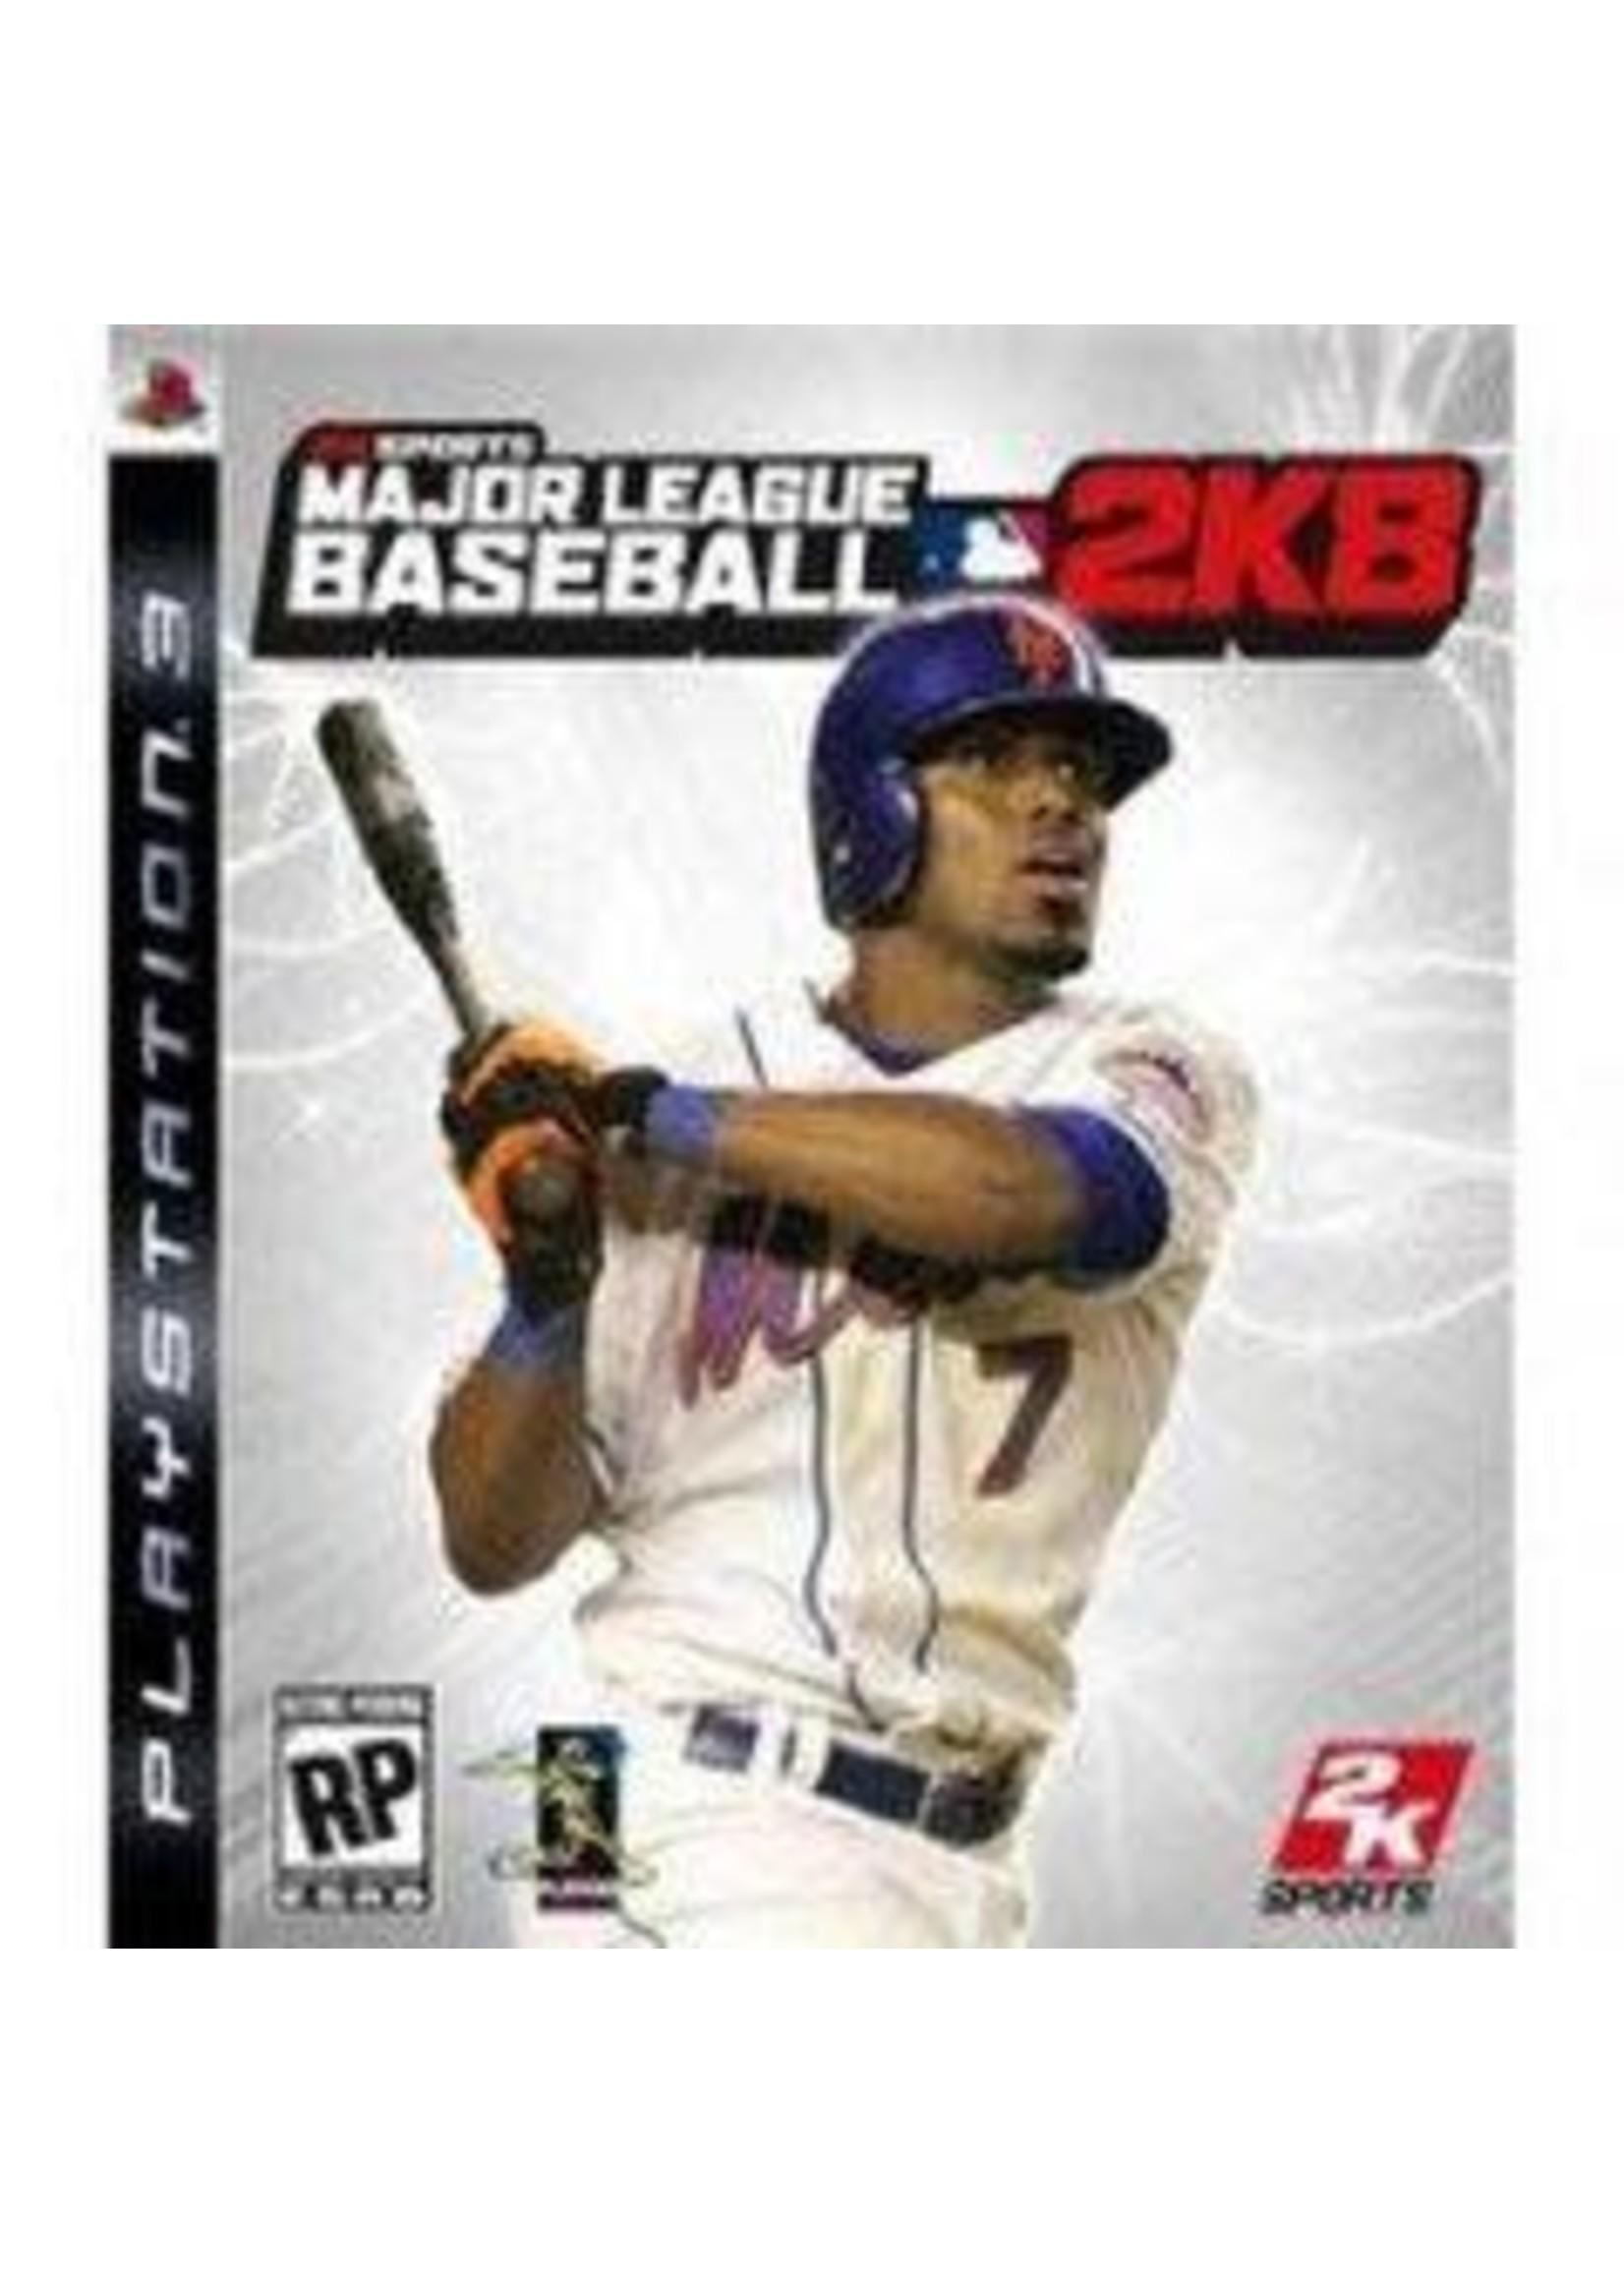 Major League Baseball 2K8 Playstation 3